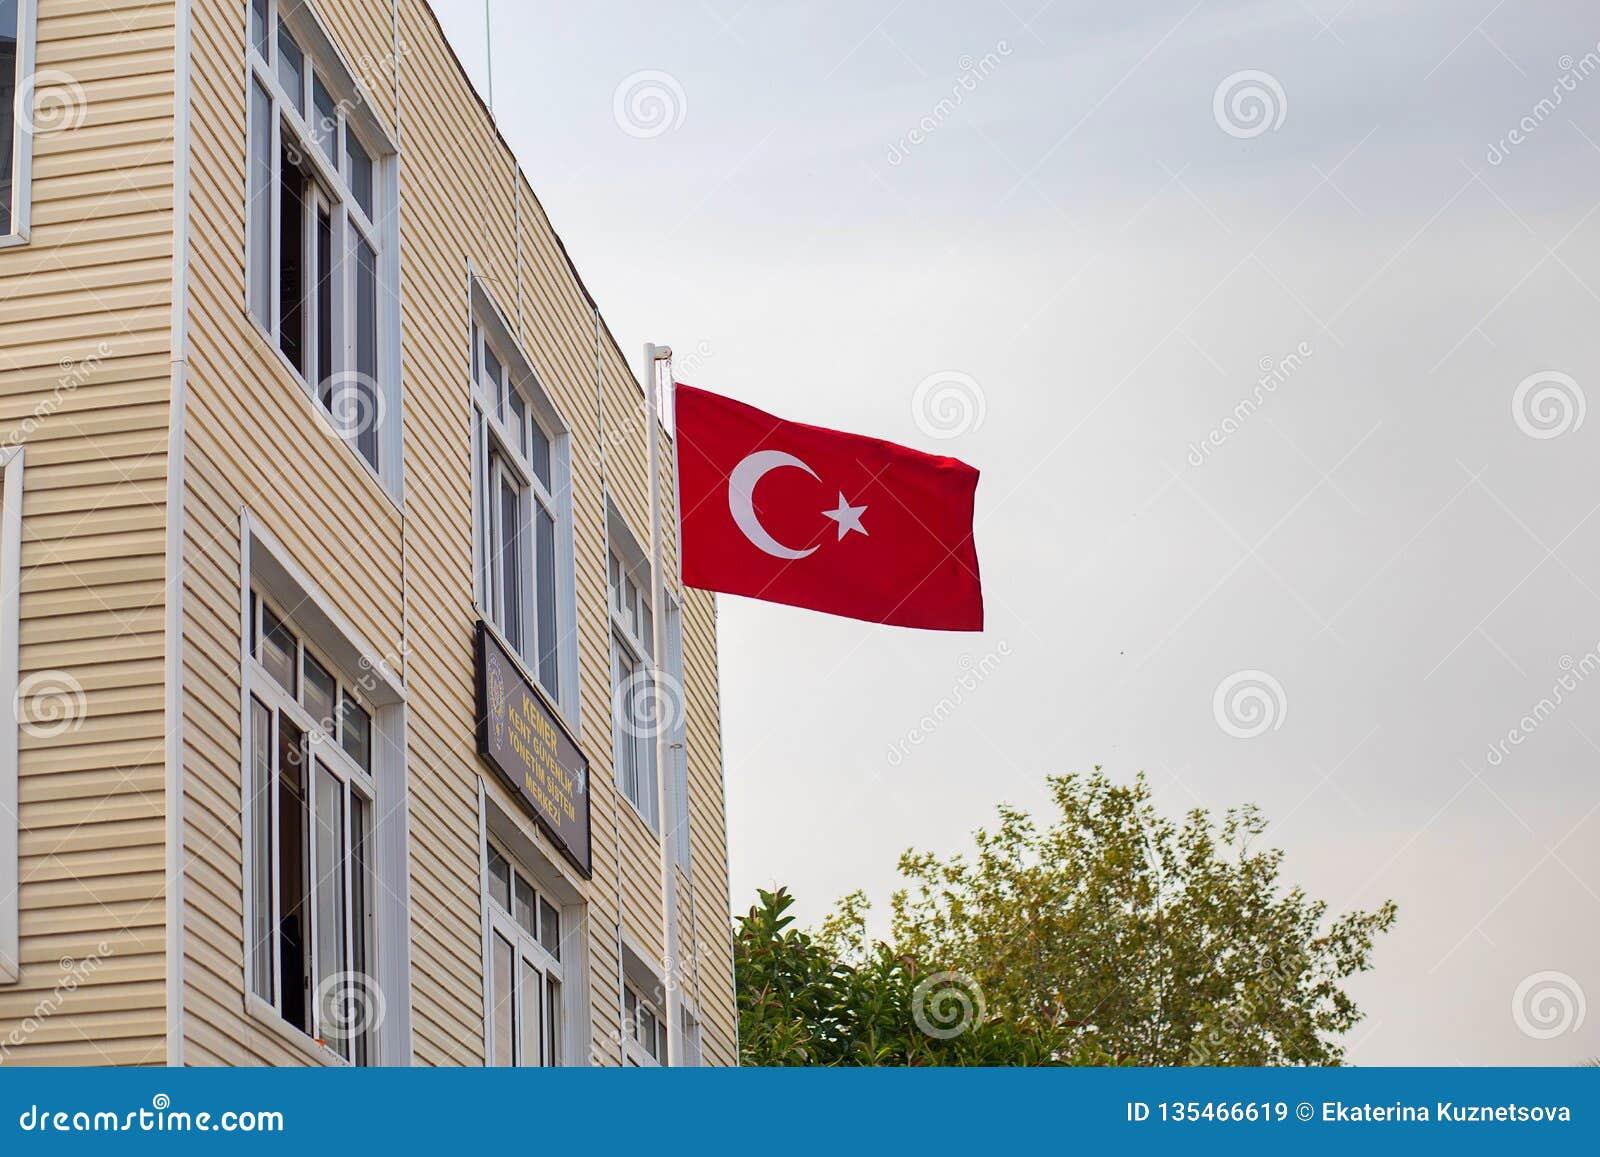 The flag of Turkey develops on wind